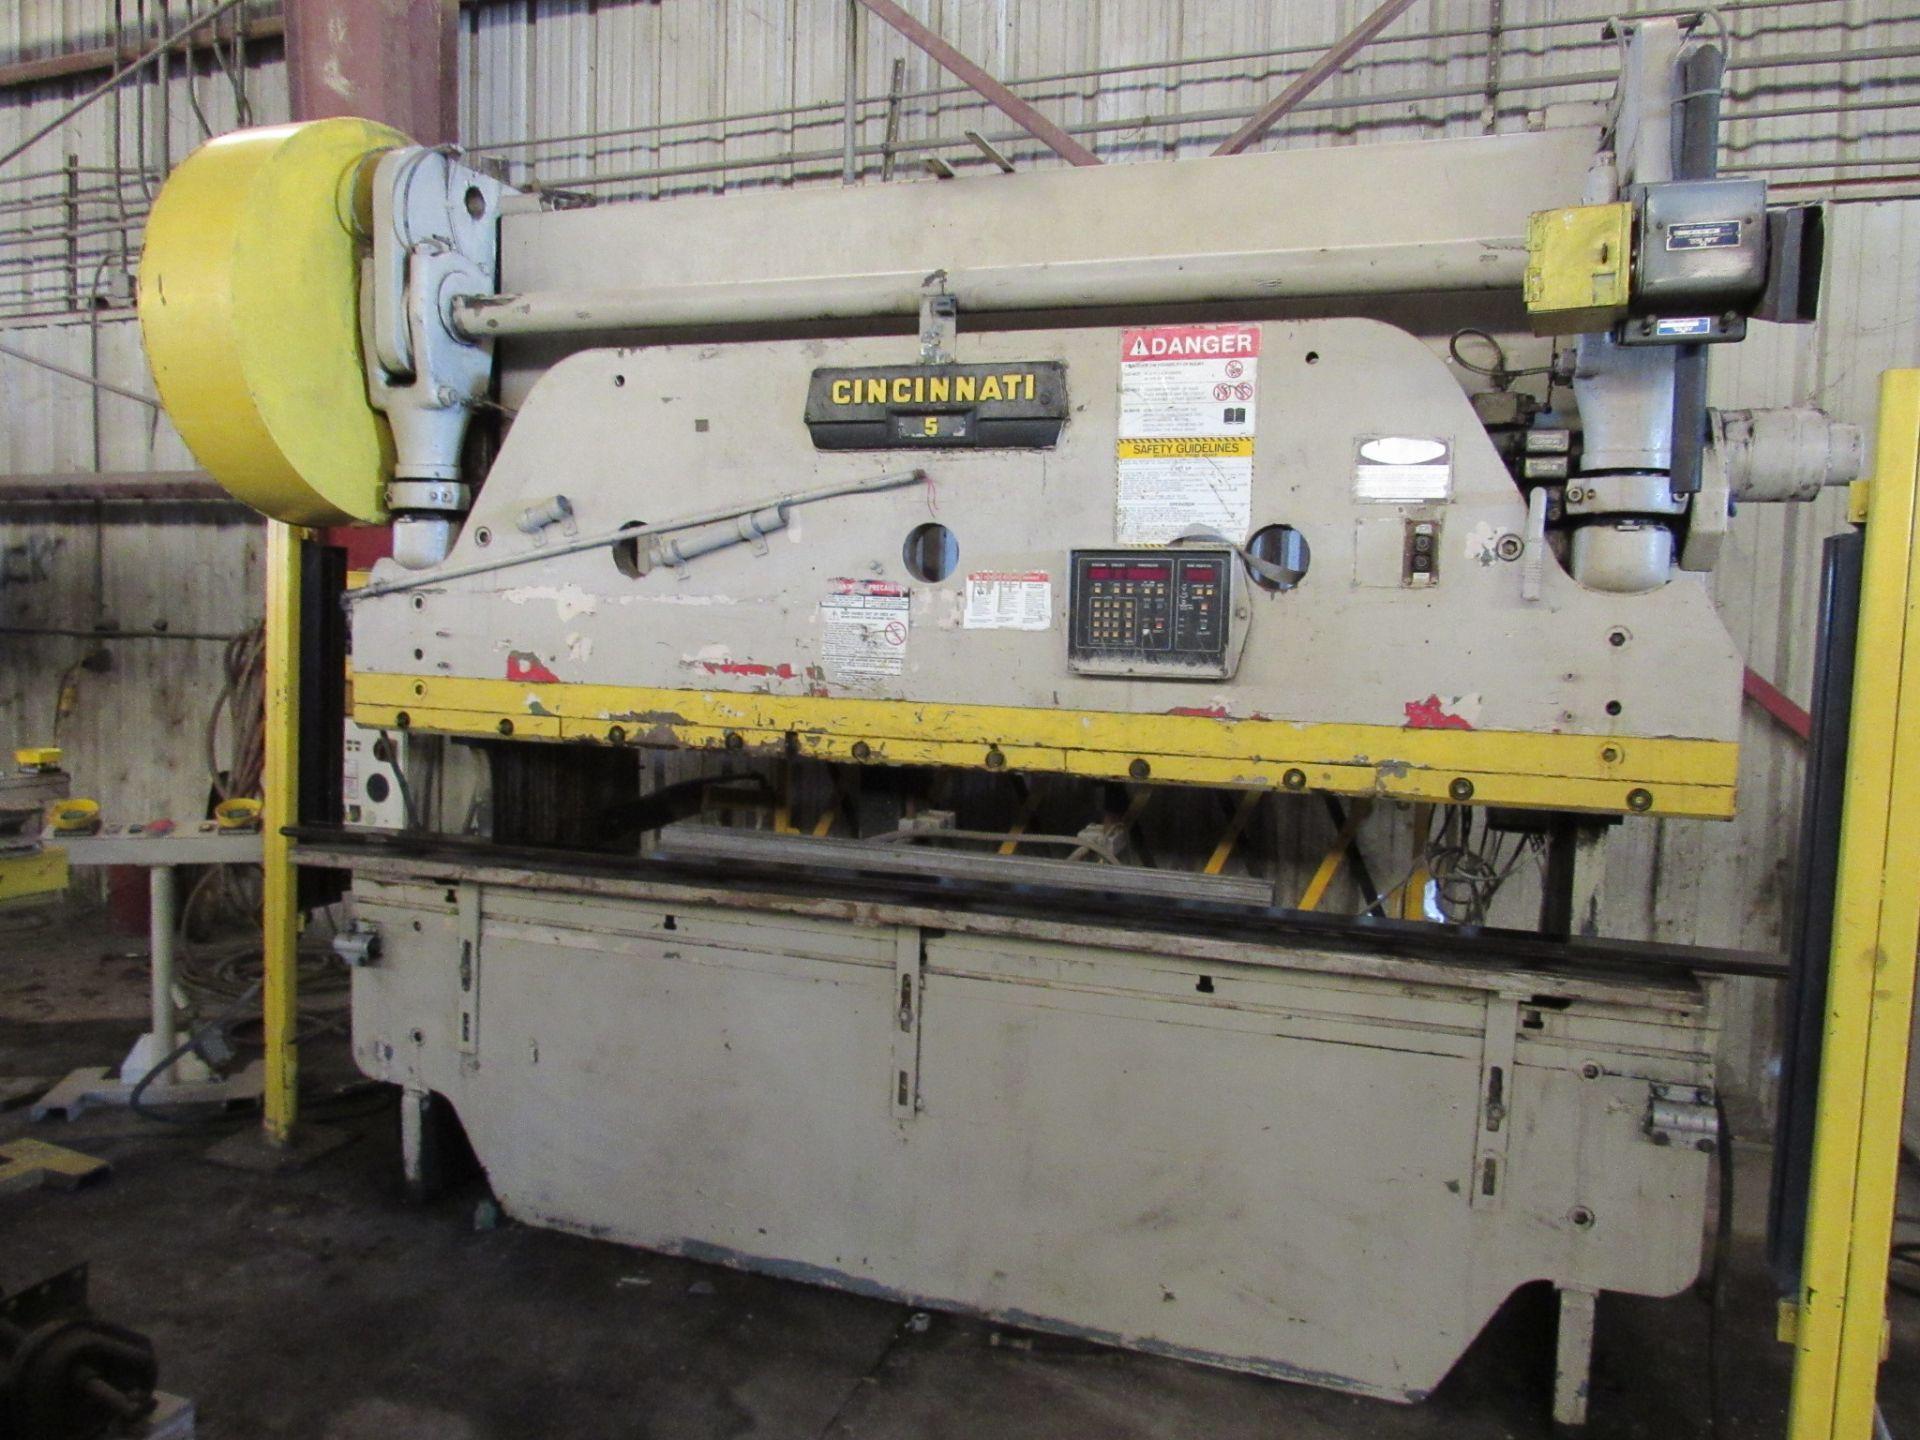 Cincinnati No. 5 Mechanical Press Brake